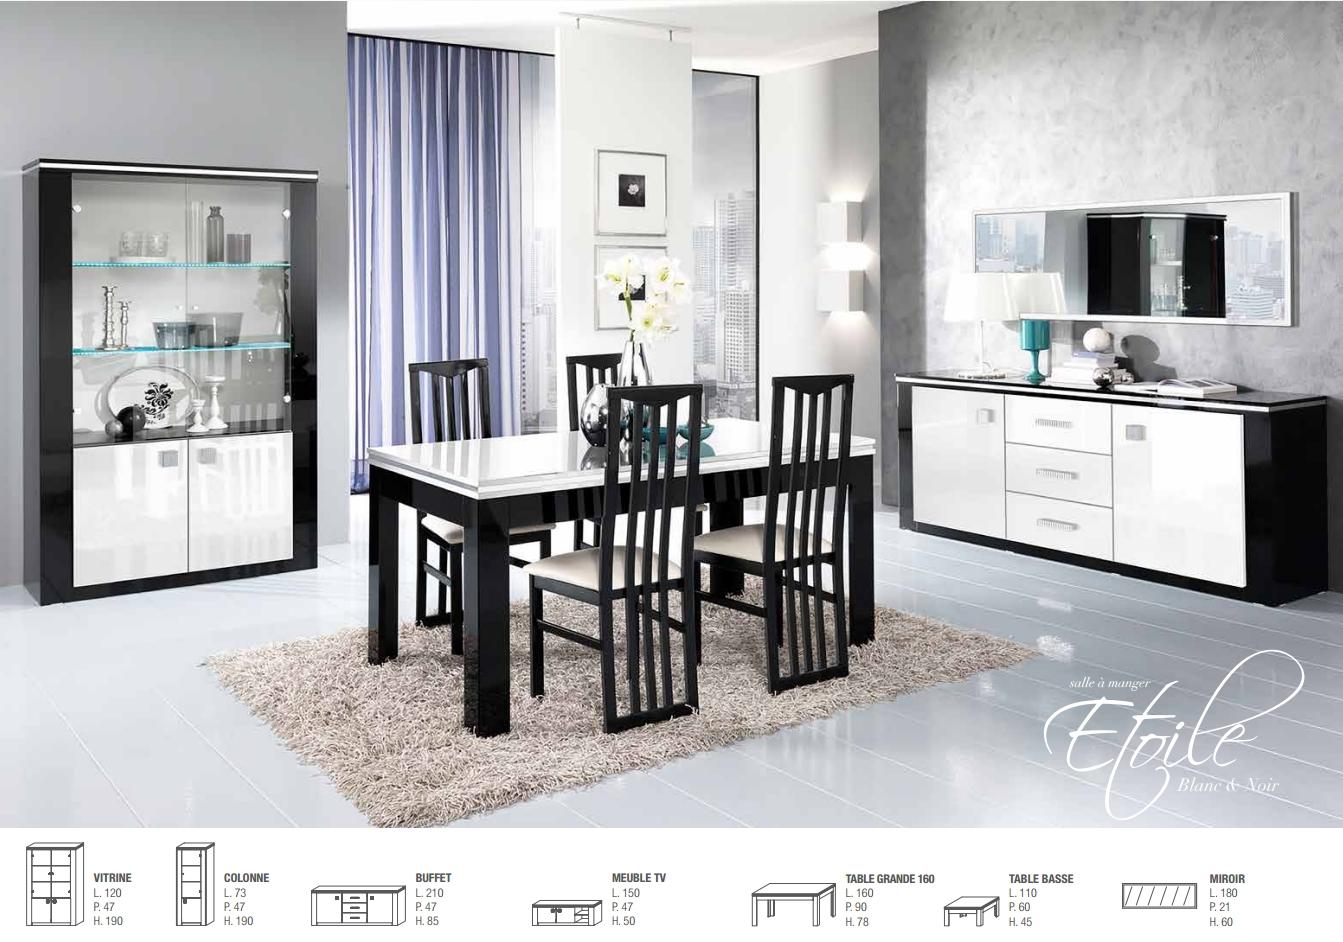 salle manger etoile nkl meuble wassa et deco. Black Bedroom Furniture Sets. Home Design Ideas